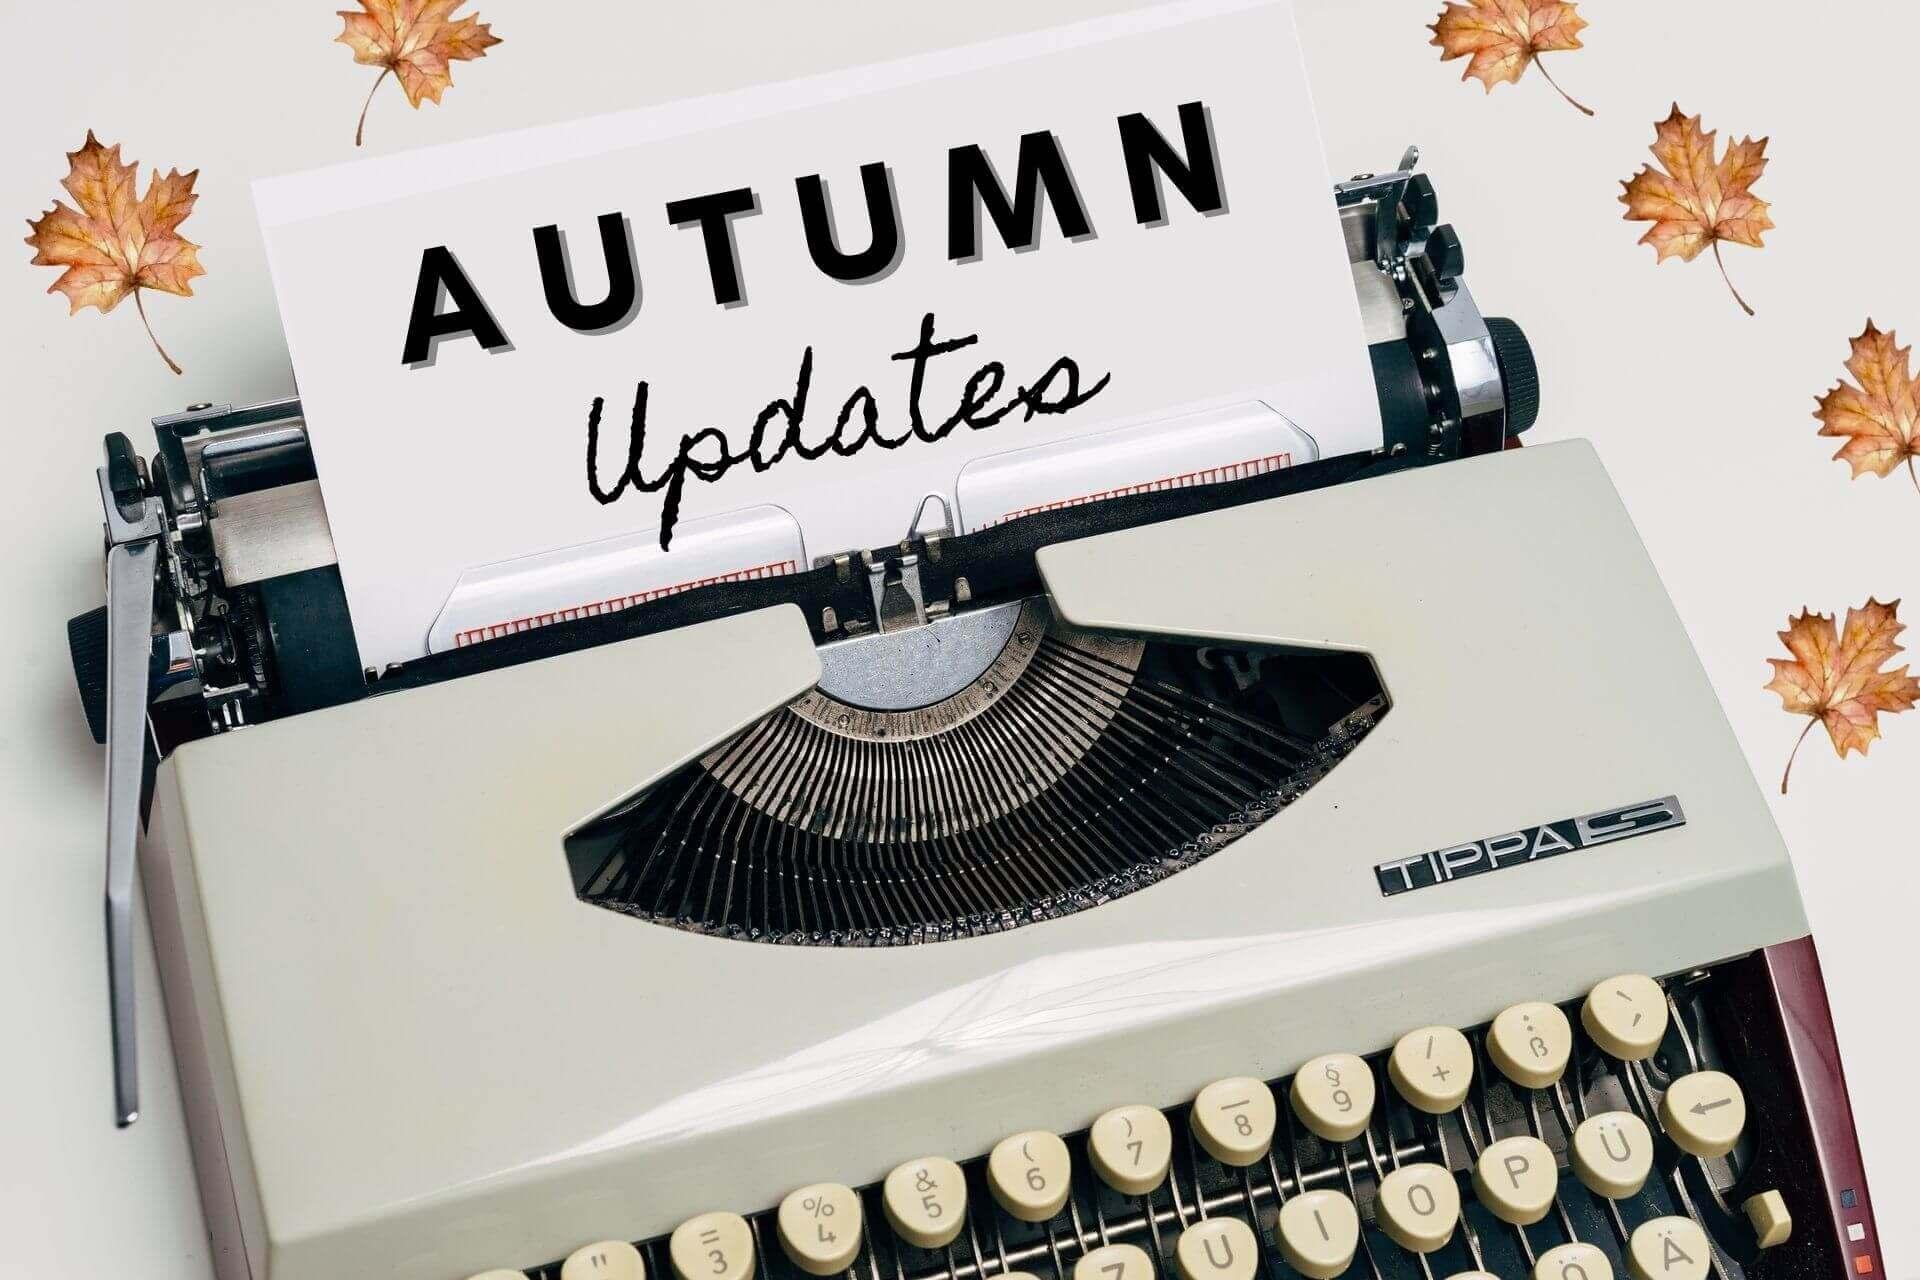 Autumn updates: meet our Knowledge Graph